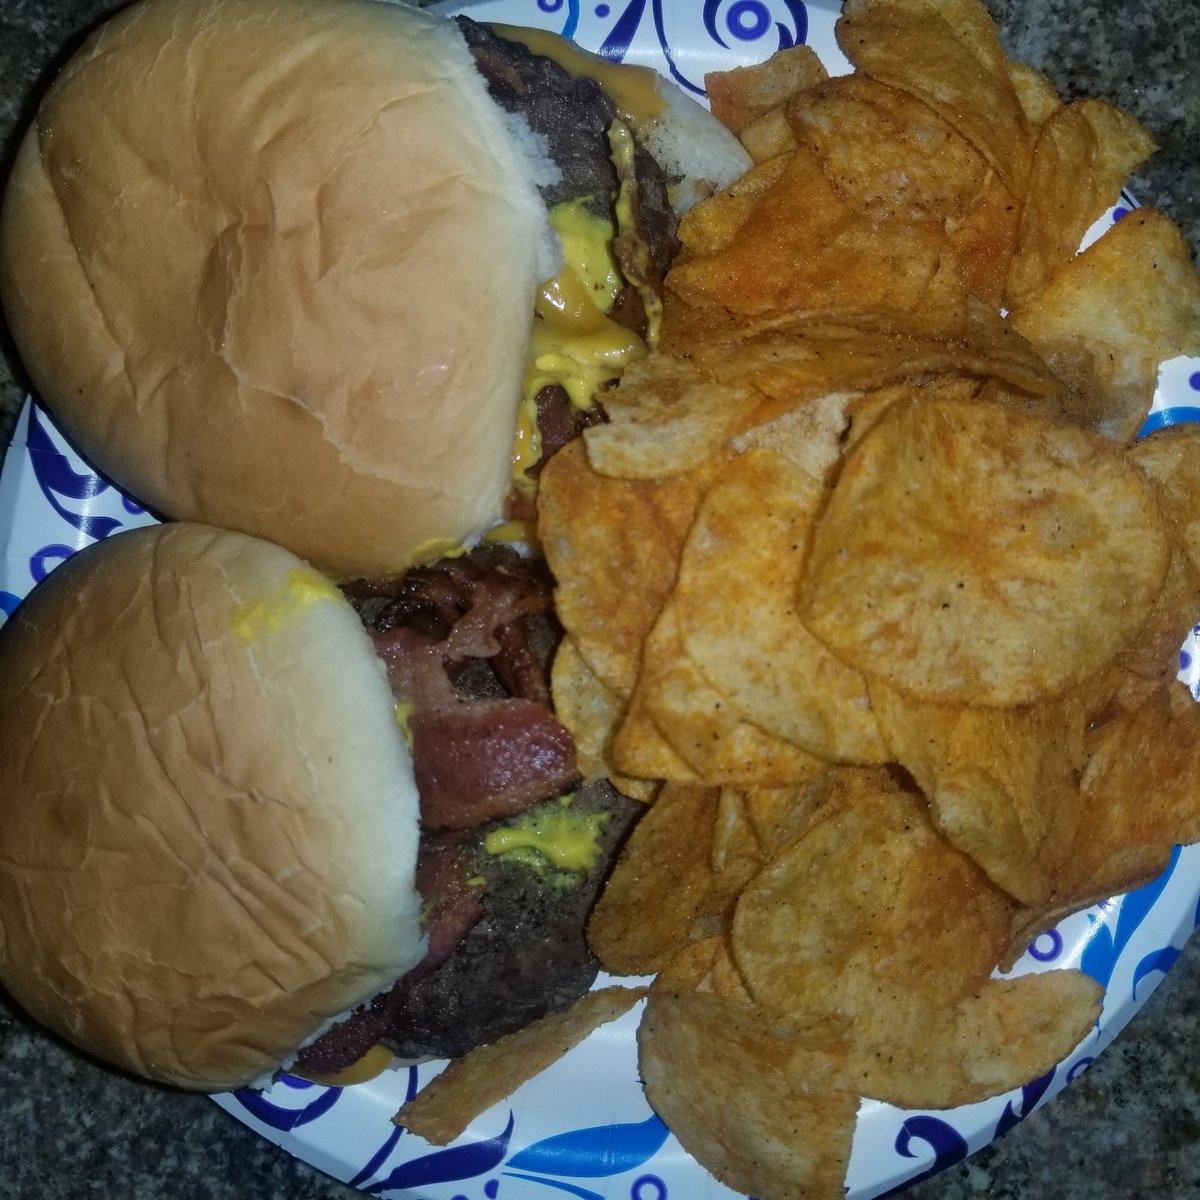 #bacon #cheeseburger https://t.co/kq6dmryOij